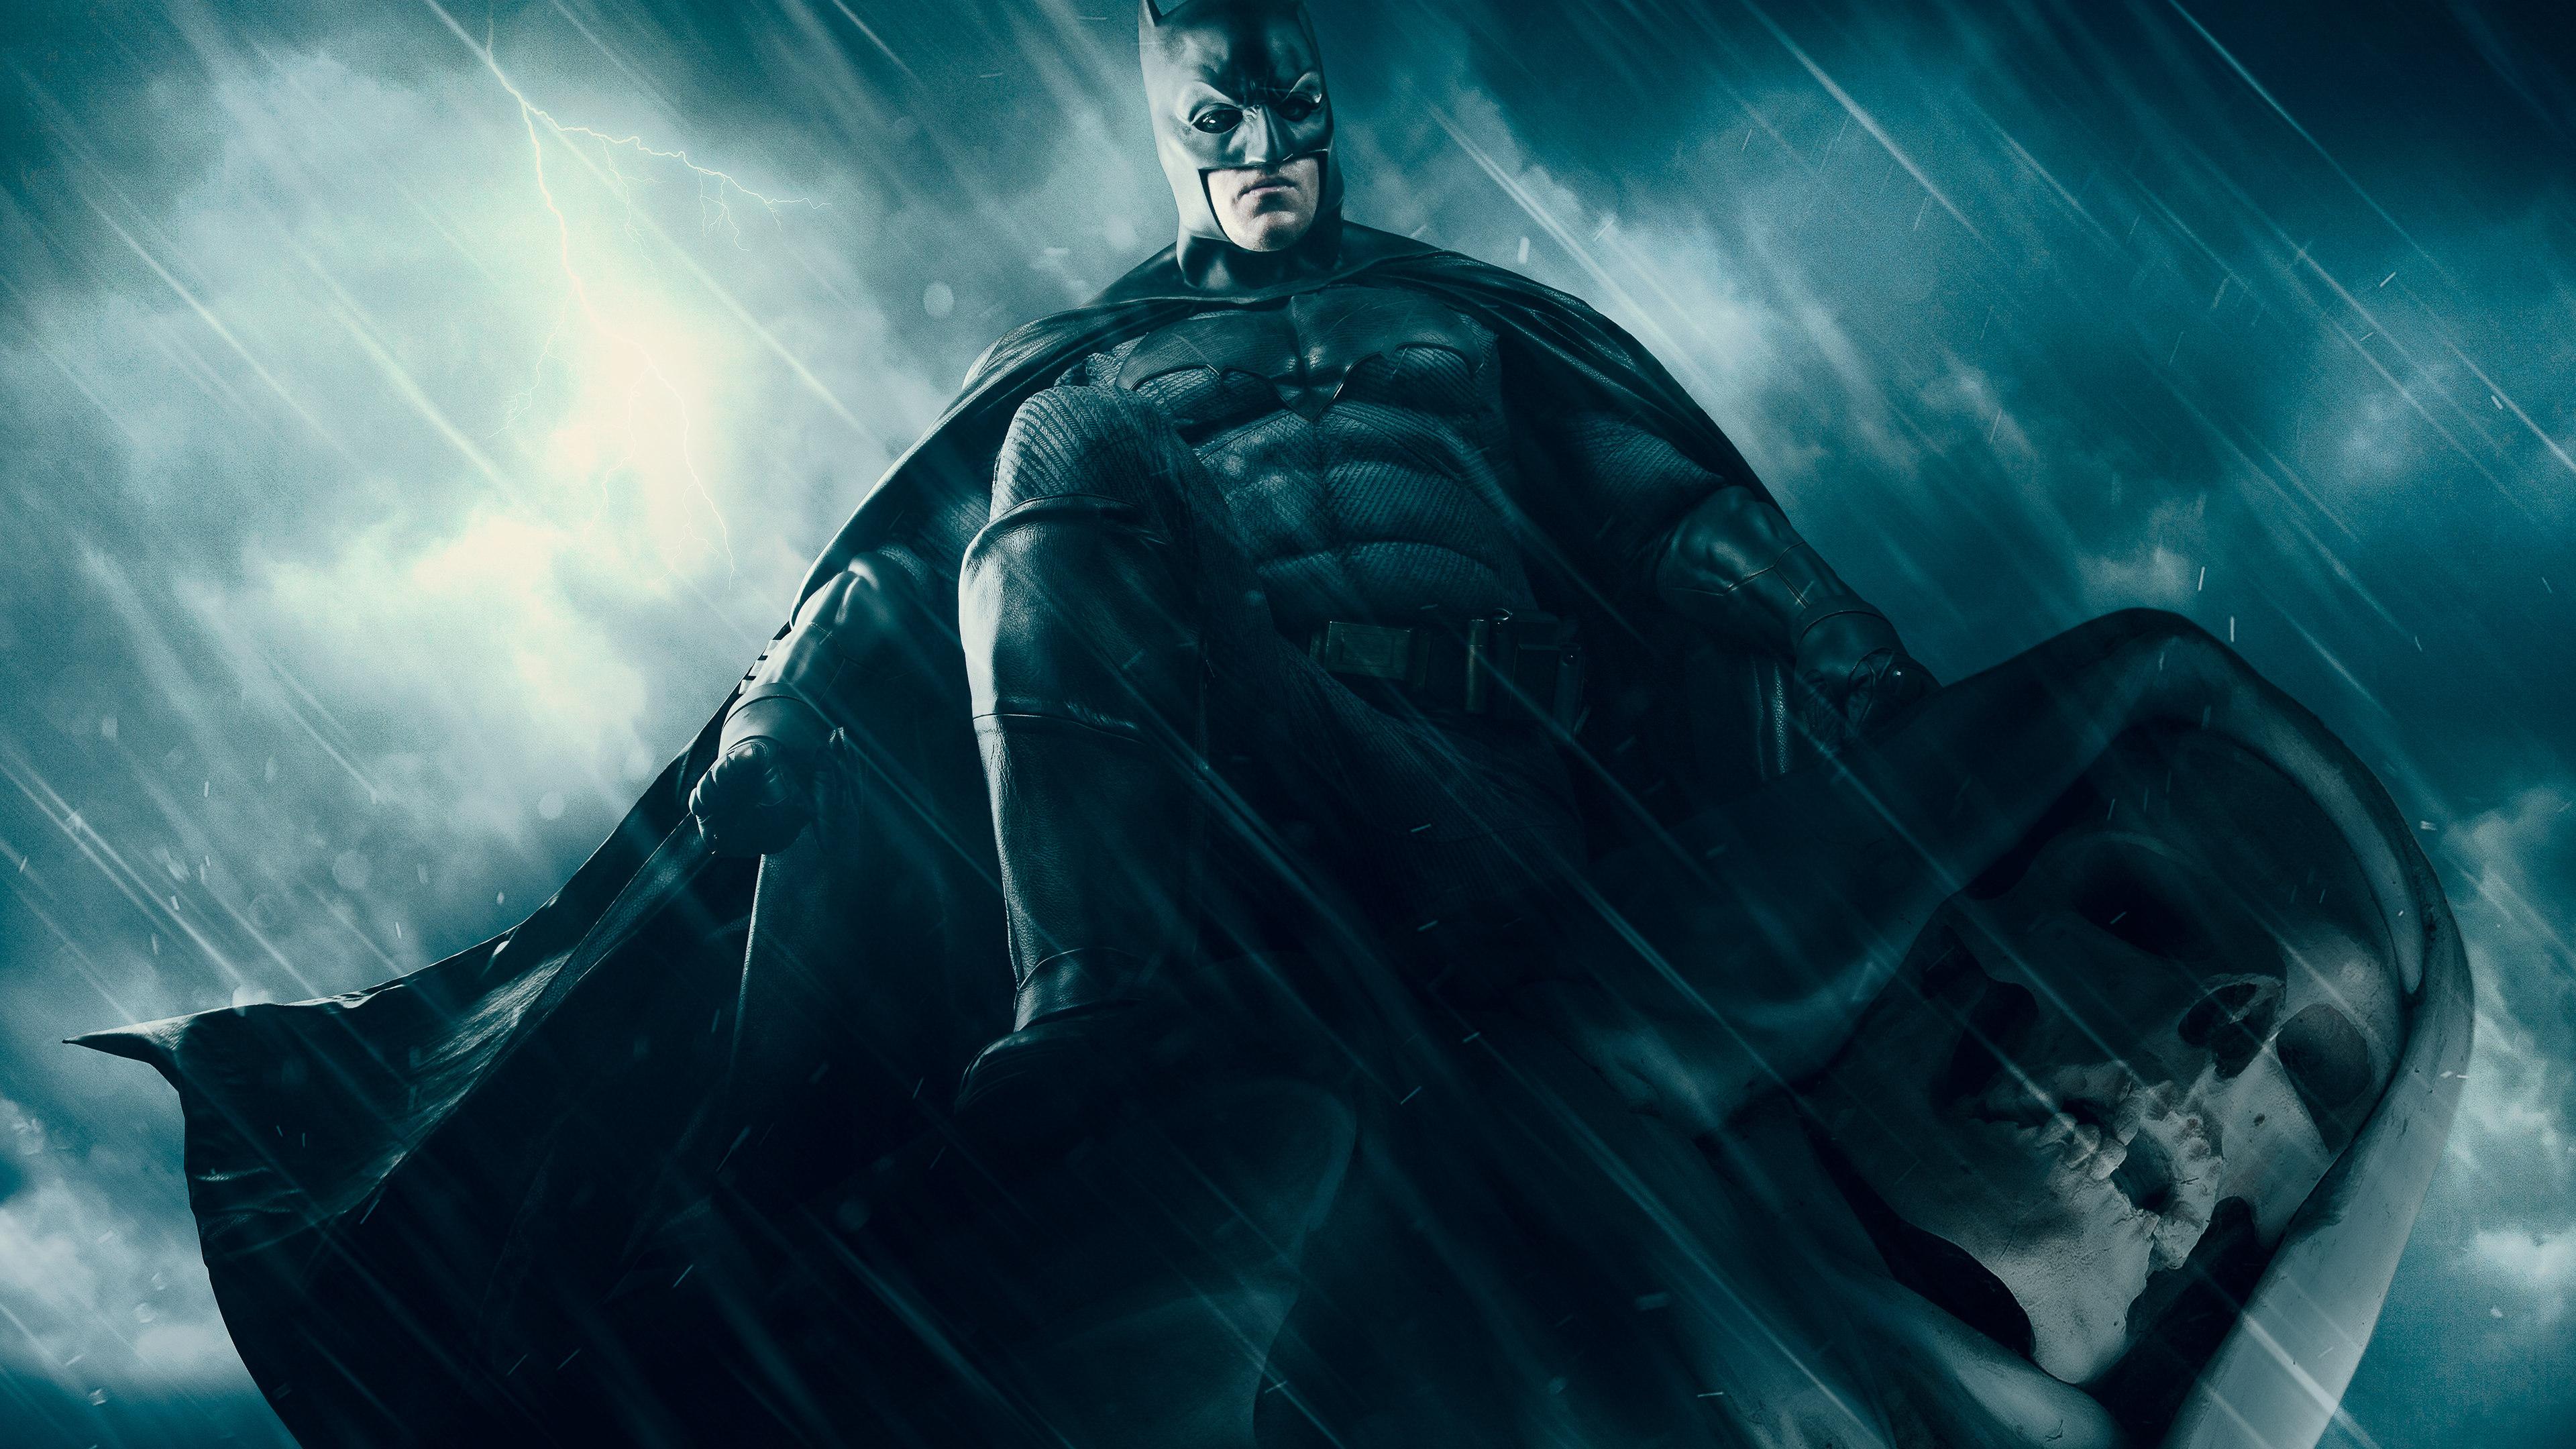 Wallpaper 4k Batman 4k Dark Knight 4k Wallpapers Batman